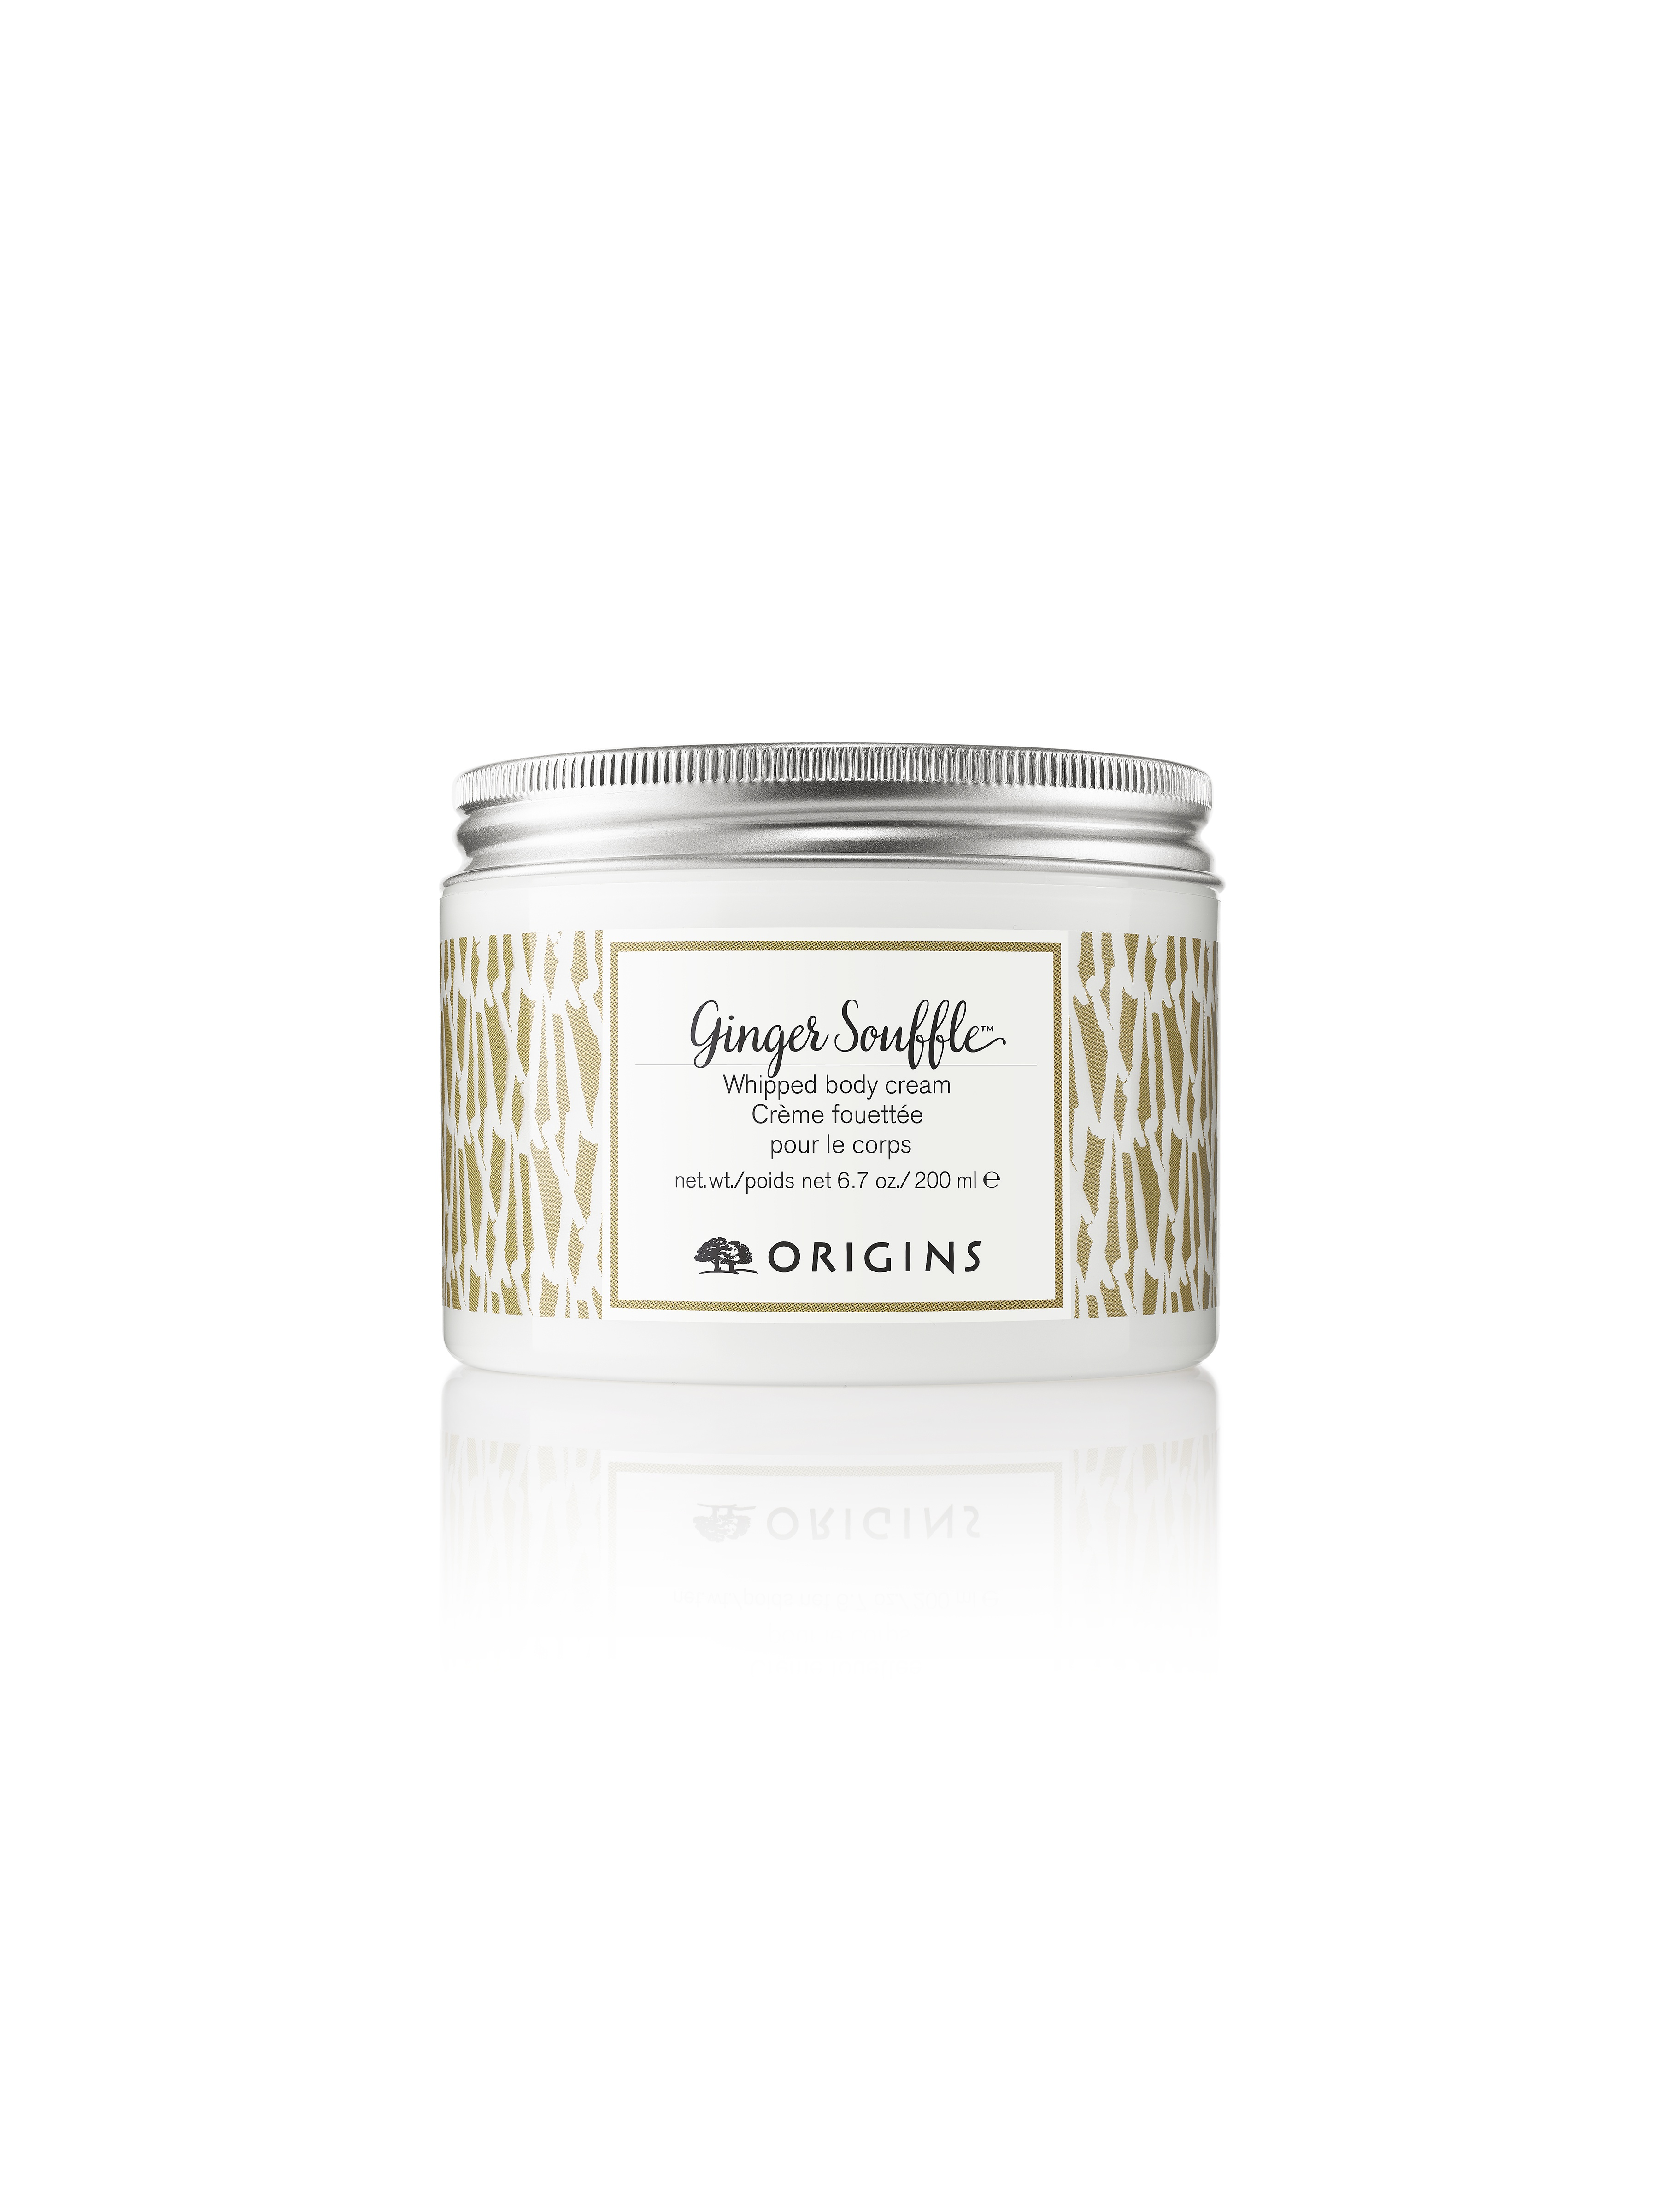 Origins Ginger Souffle Whipped Body Cream, 200 ml